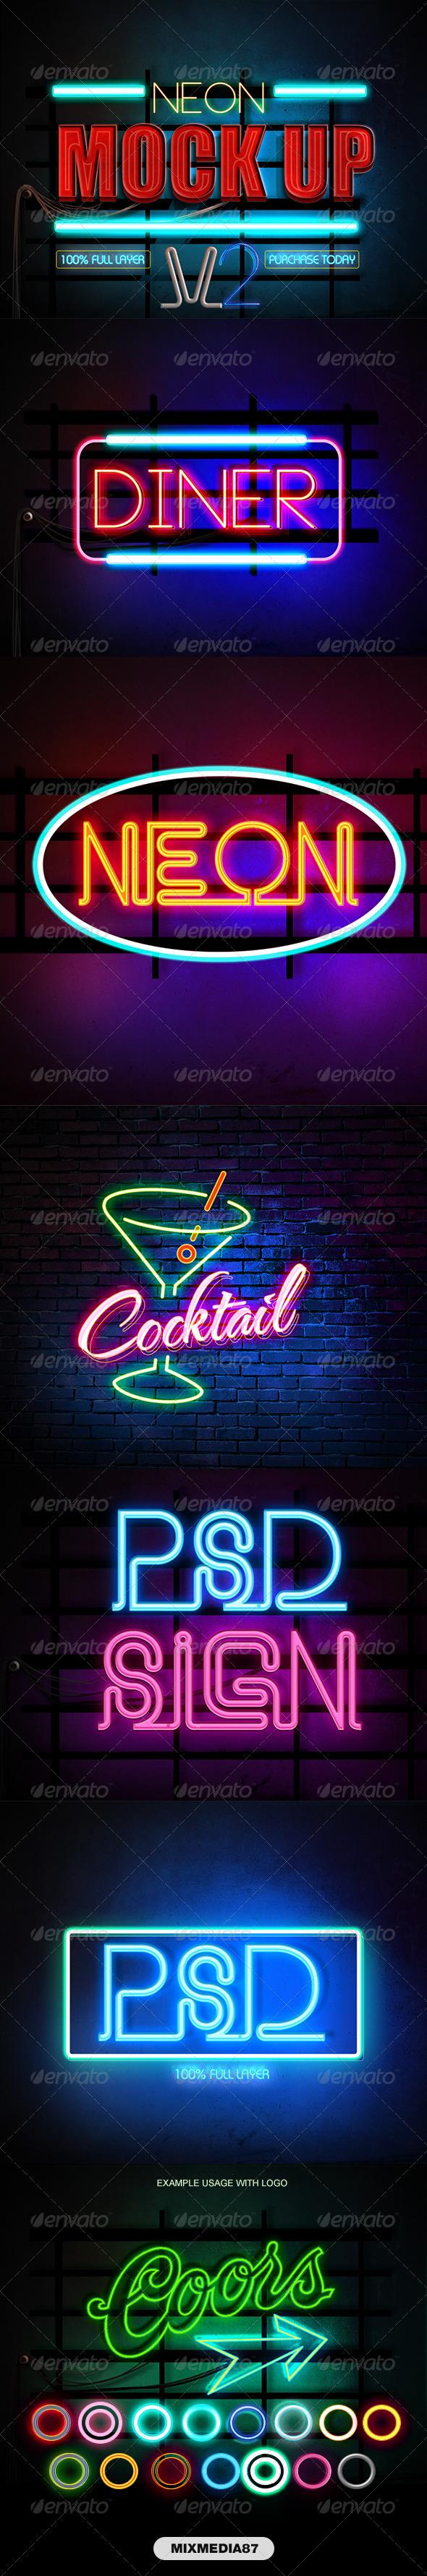 GraphicRiver Neon Styles V2 7004763